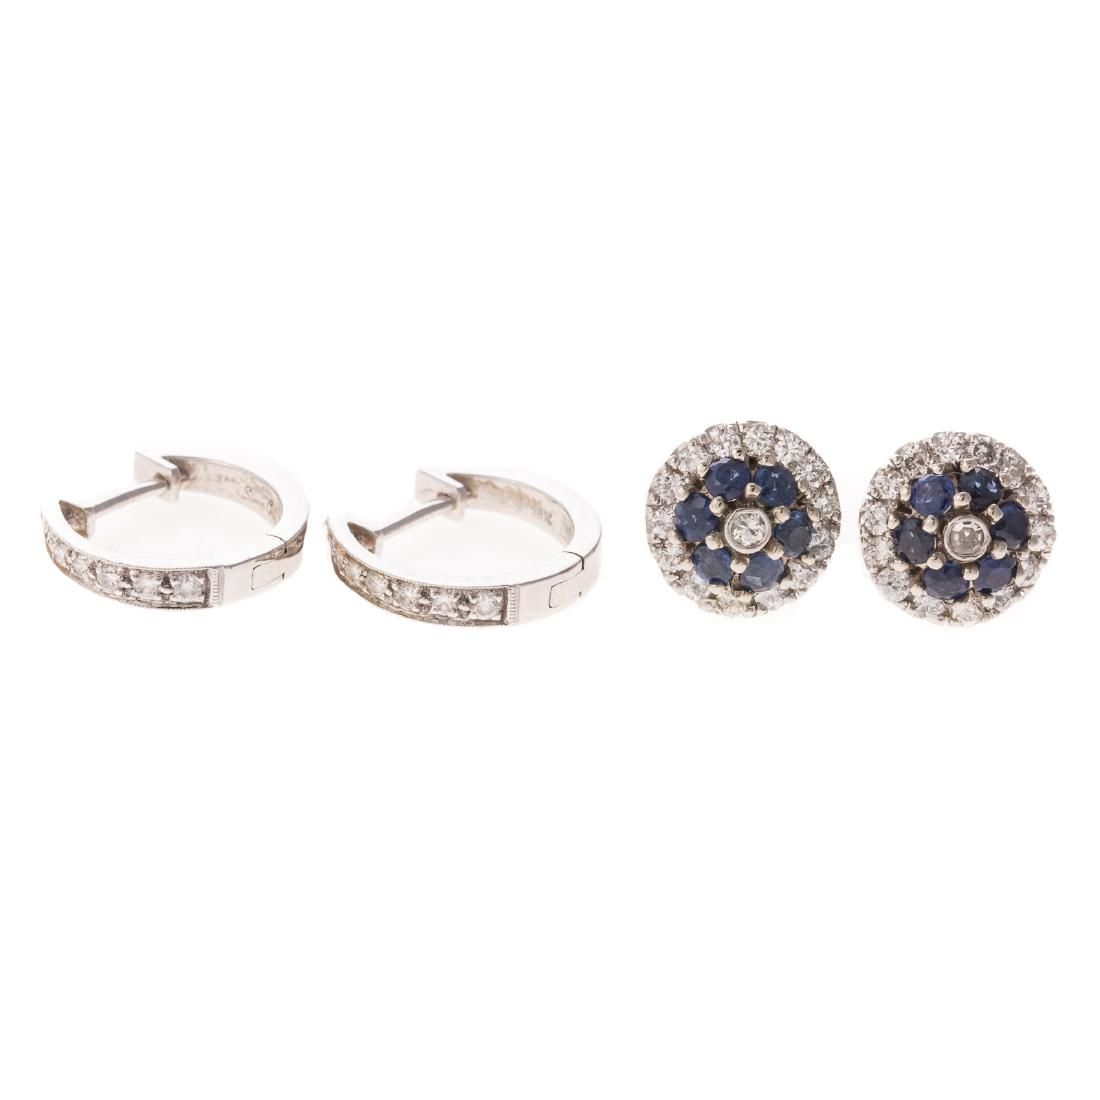 A Pair of Sapphire & Diamond Studs & Diamond Hoops